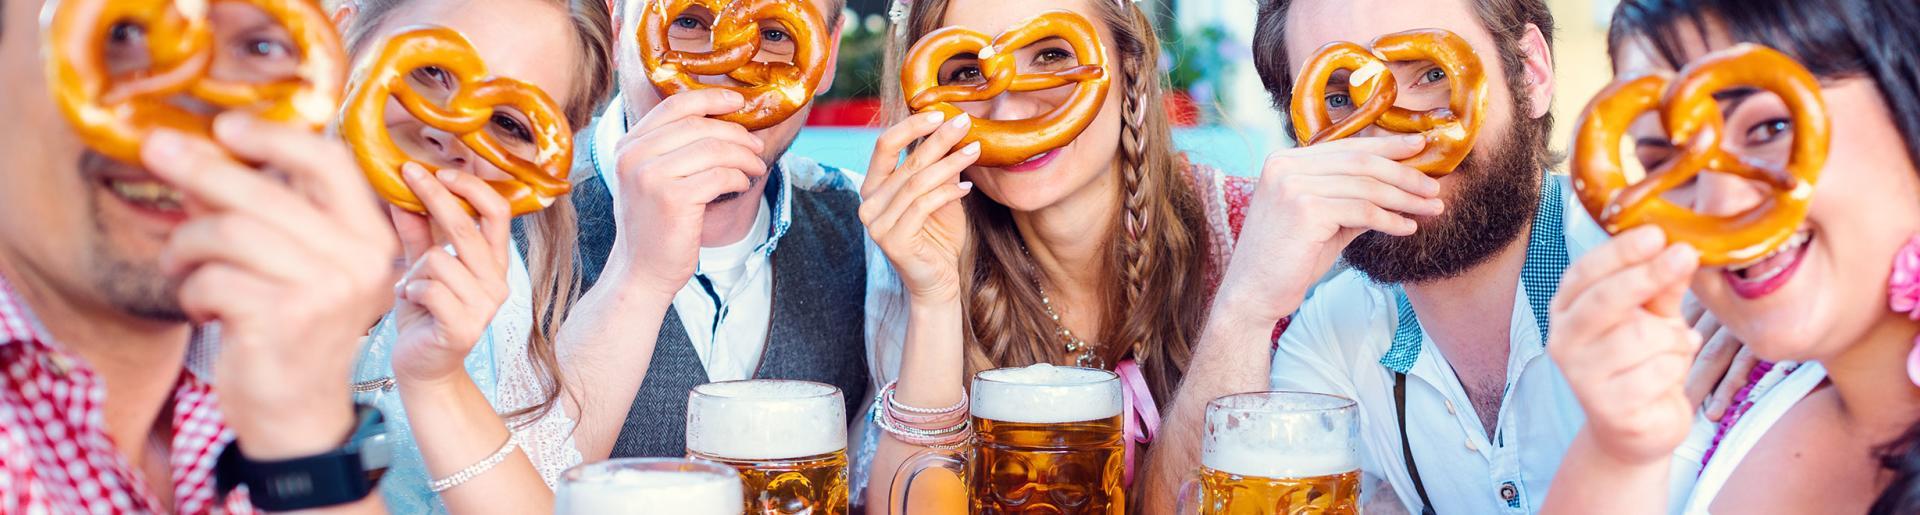 A group of friends at an Oktoberfest peer through the holes in a soft pretzel